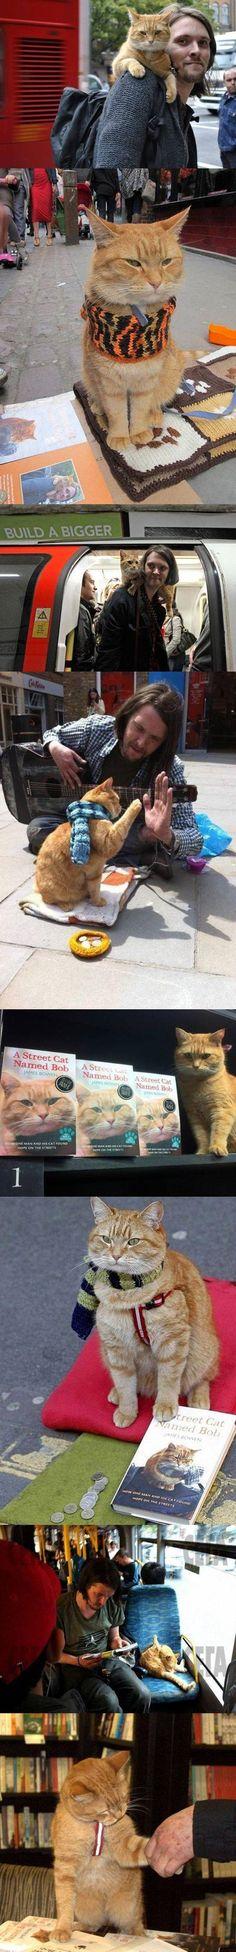 A Street Cat Named Bob | Images